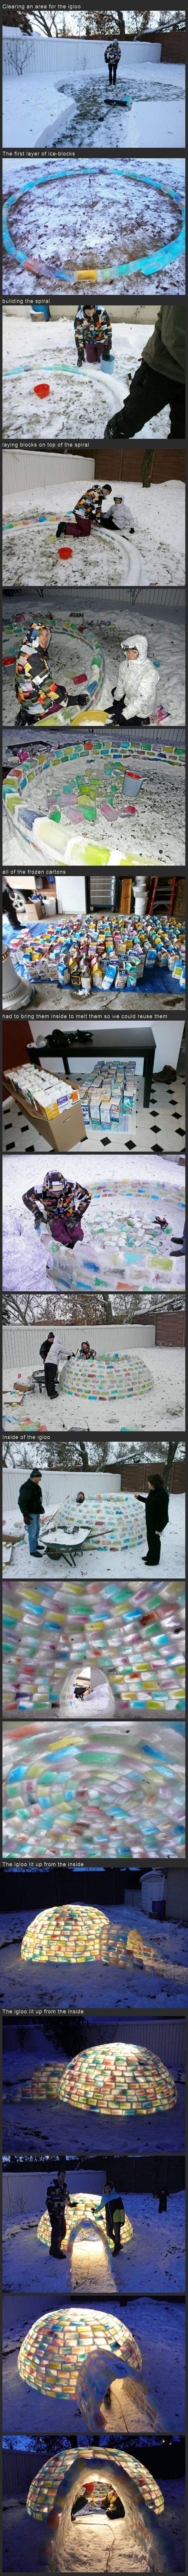 how to build an igloo,